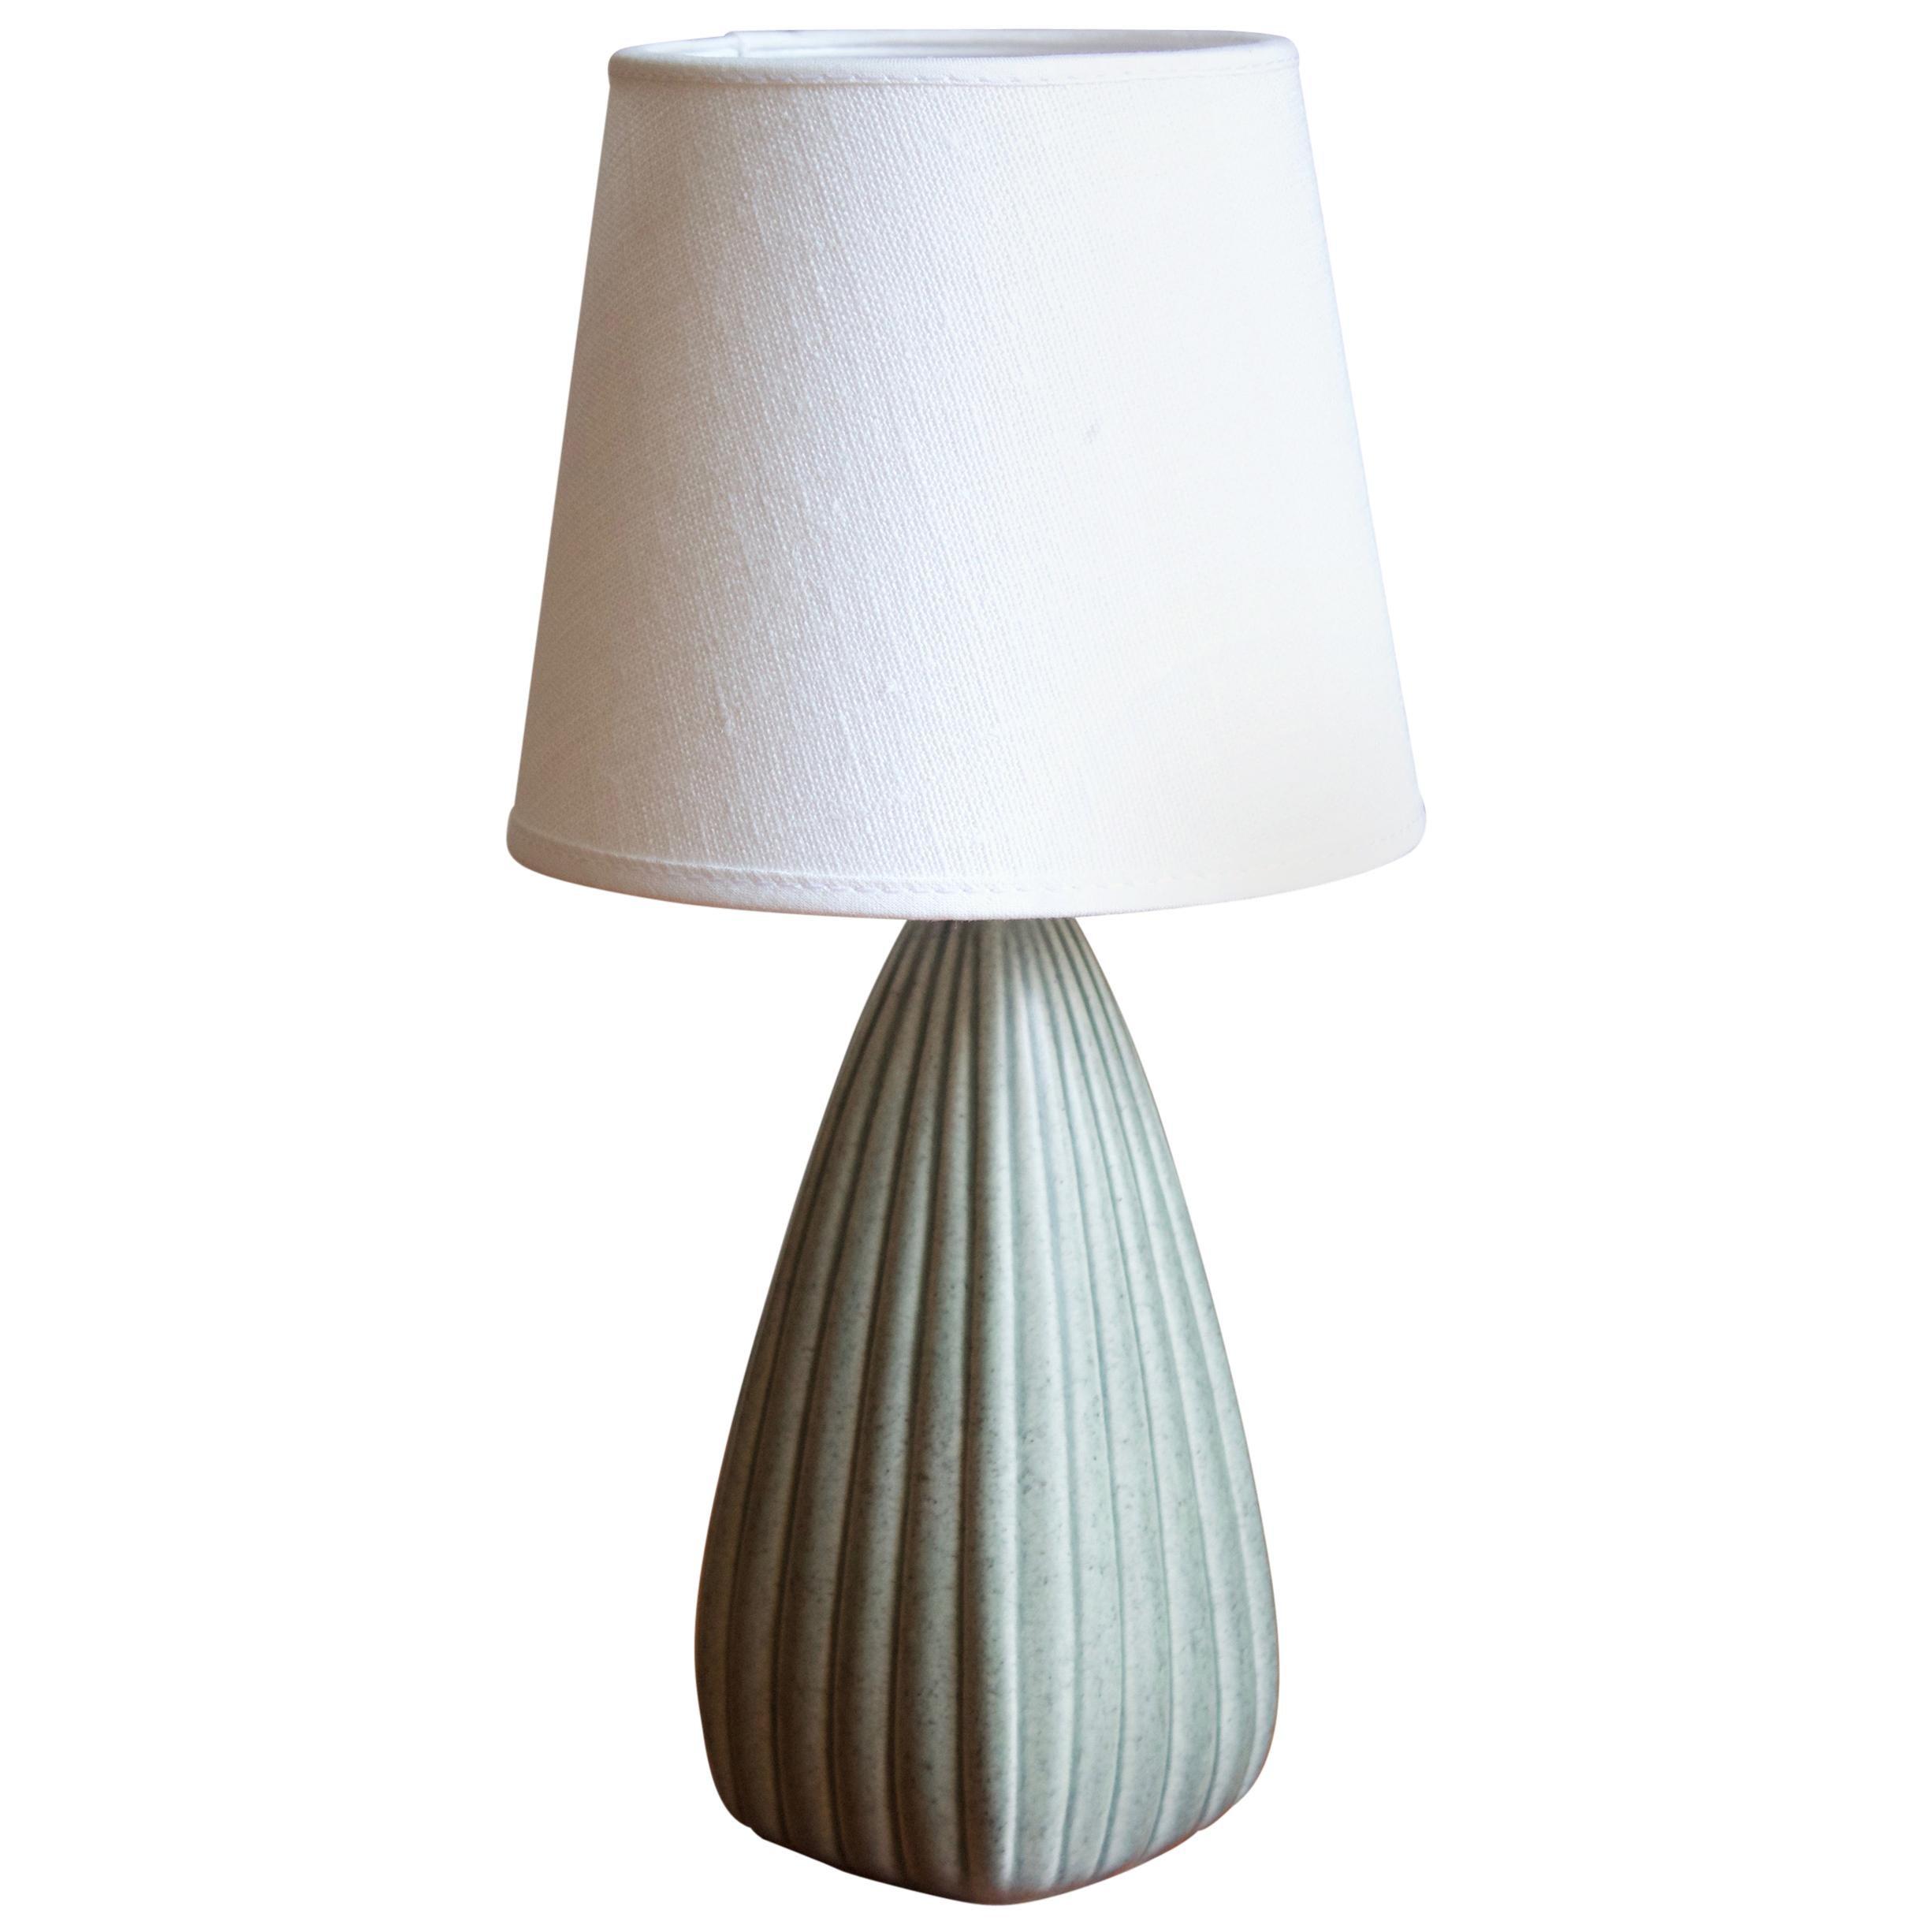 Danish Designer, Small Table Lamp, Glazed Ceramic, Denmark, c. 1960s